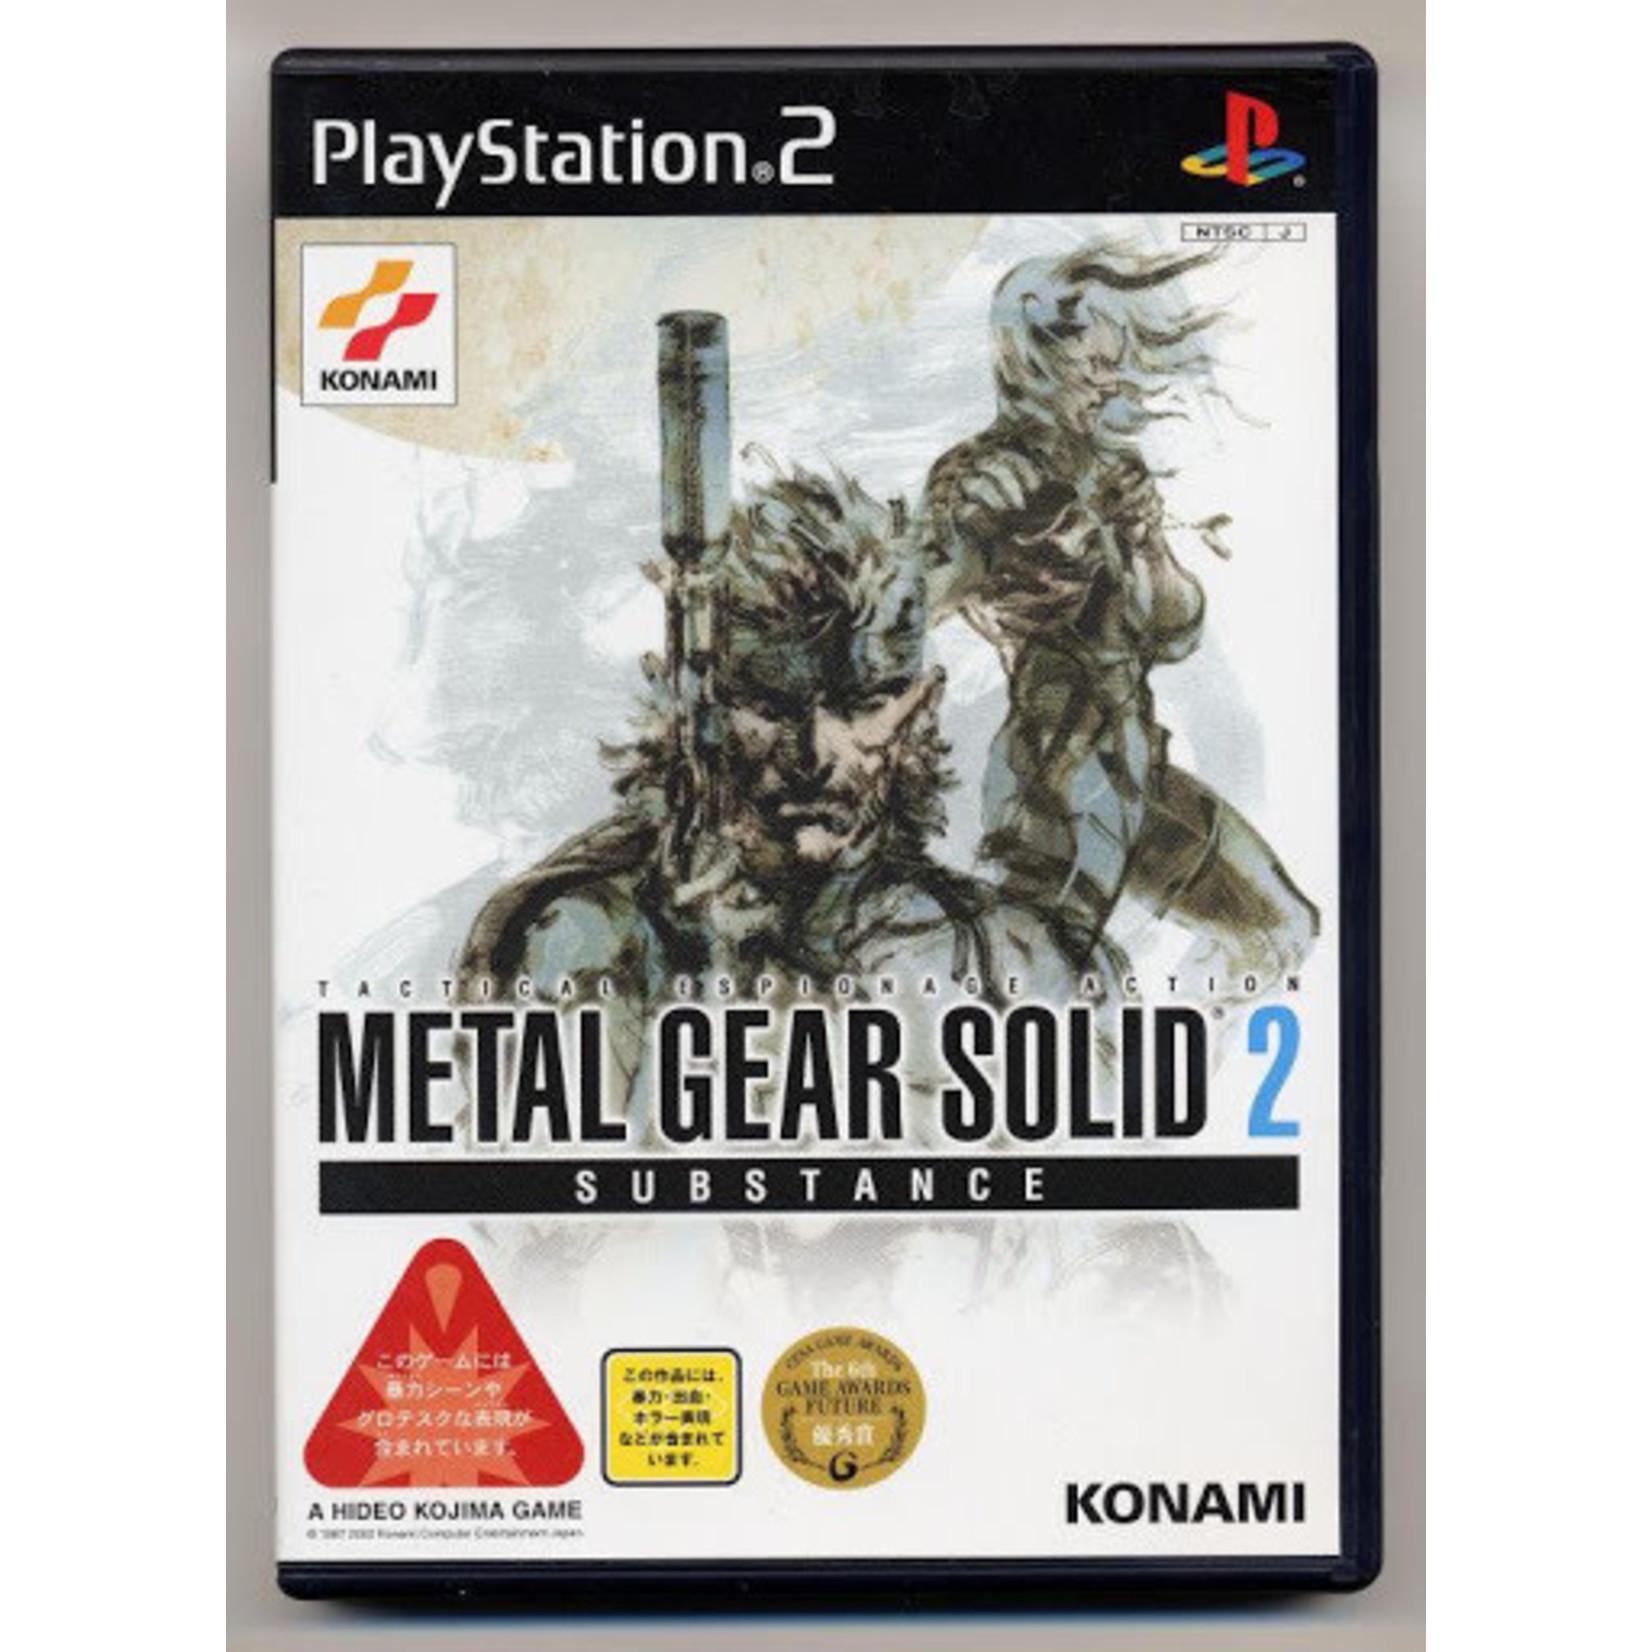 IMPORT-PS2U-Metal Gear Solid 2 Substance